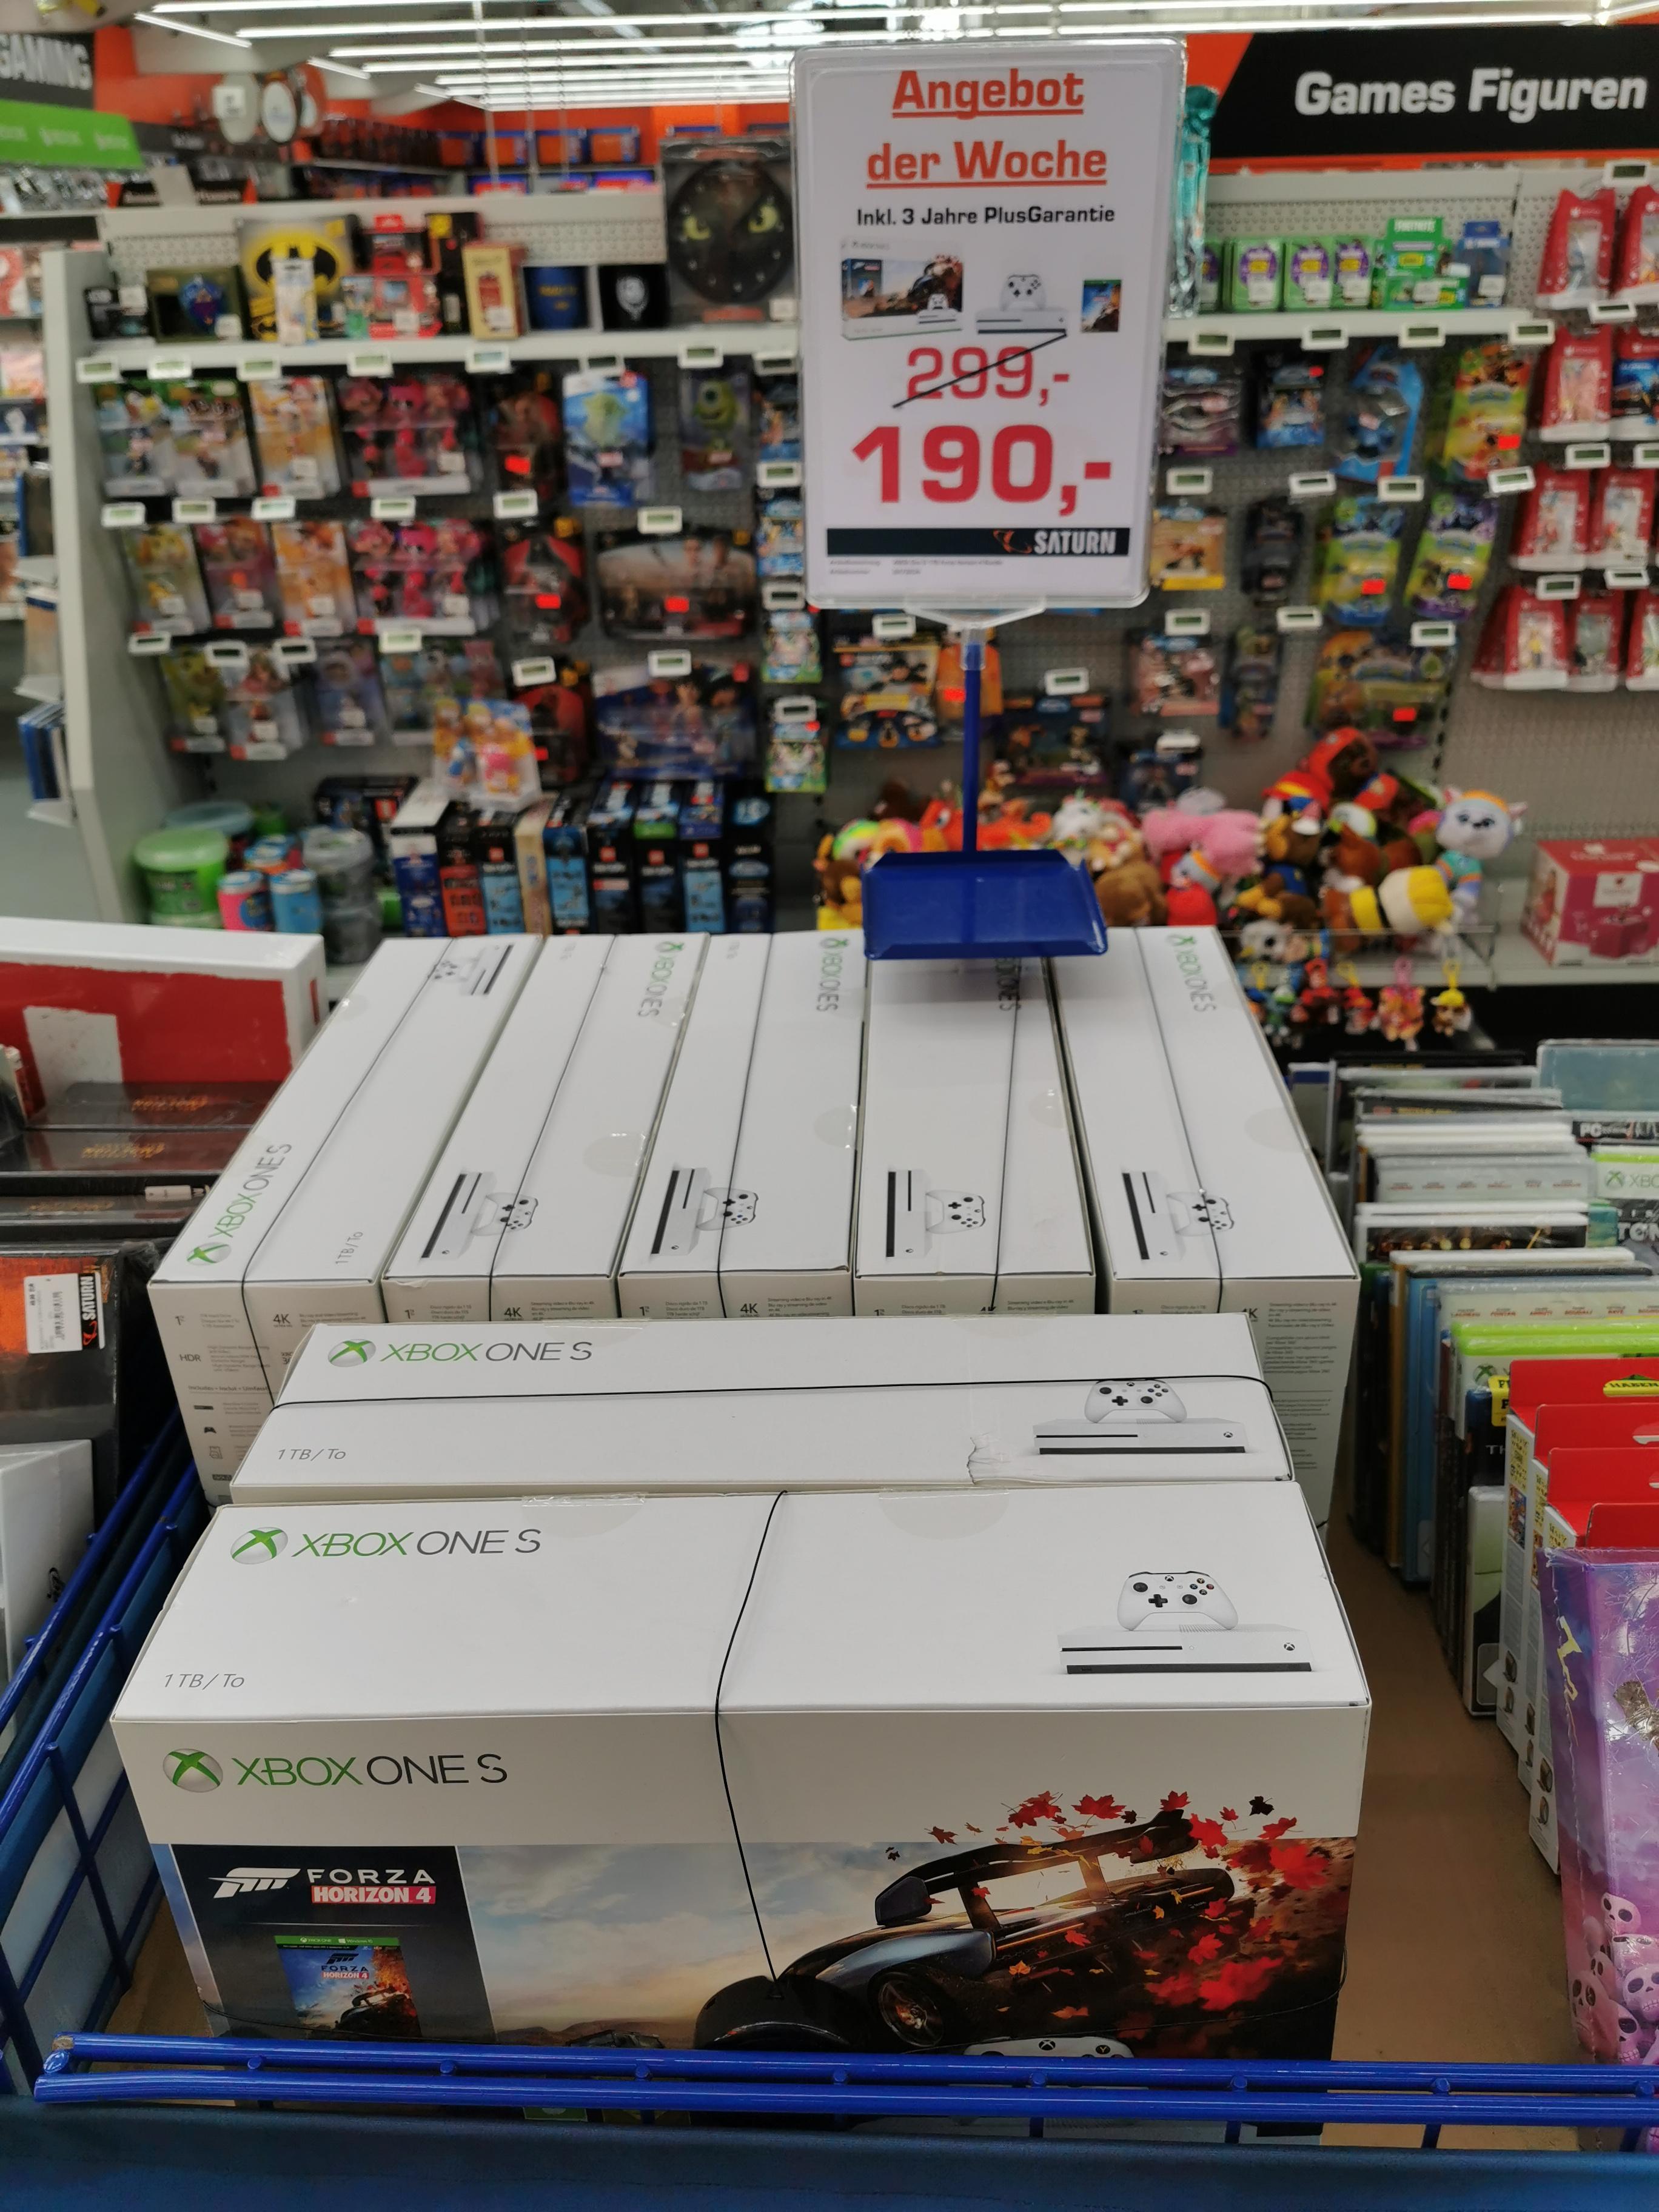 (Lokal Saturn Kempten Allgäu) XBOX ONE S 1 TB Forza Horizon 4 Bundle + 3 Jahre PlusGarantie